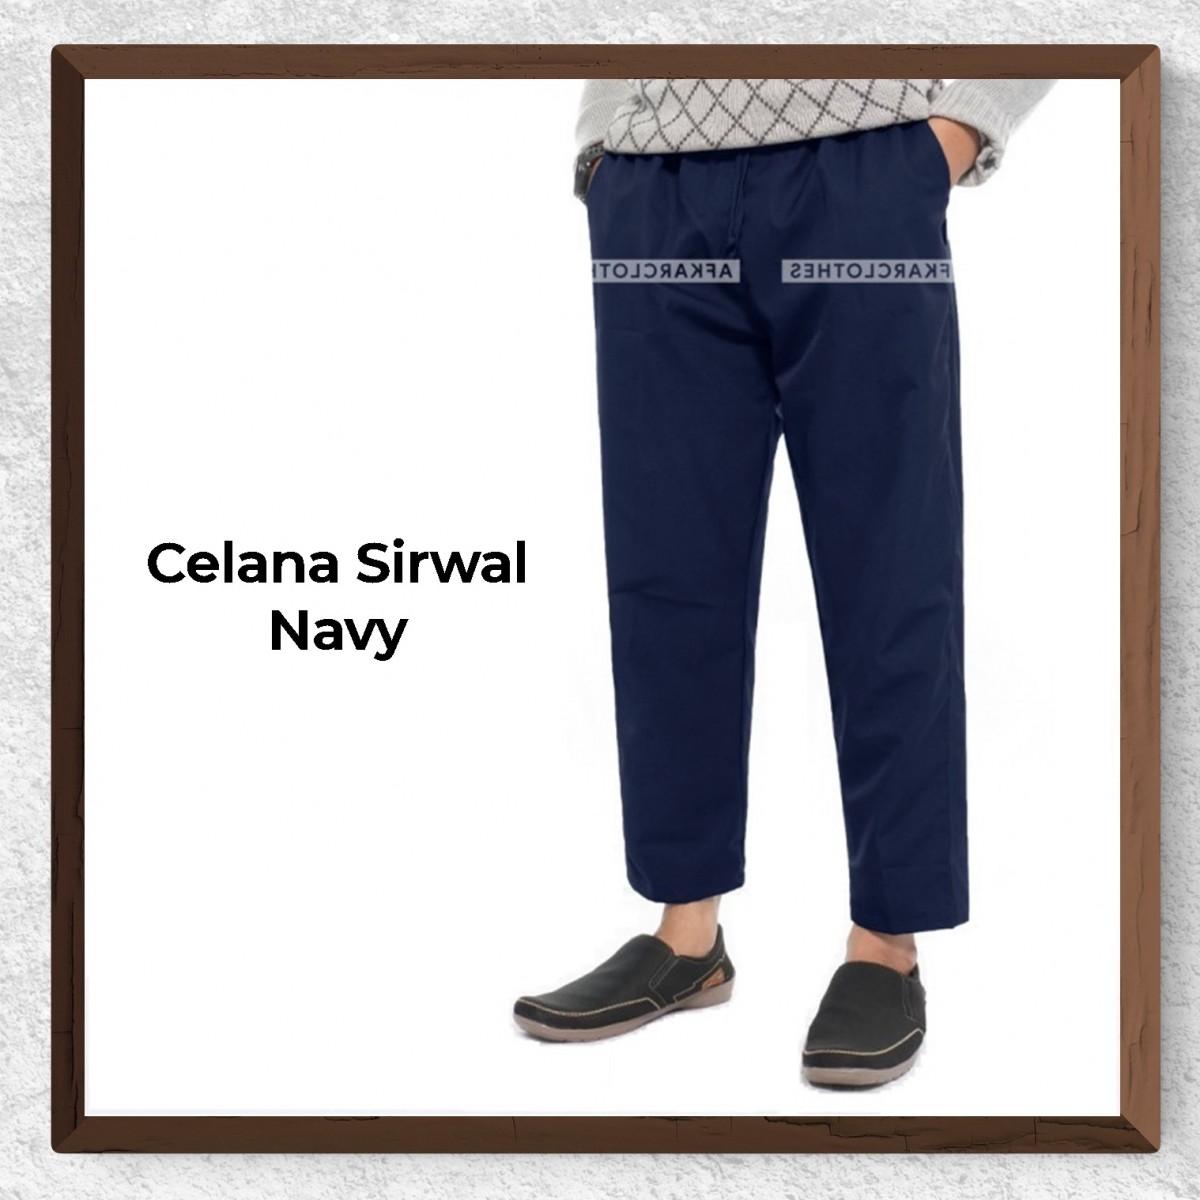 Celana Sirwal Warna Navy